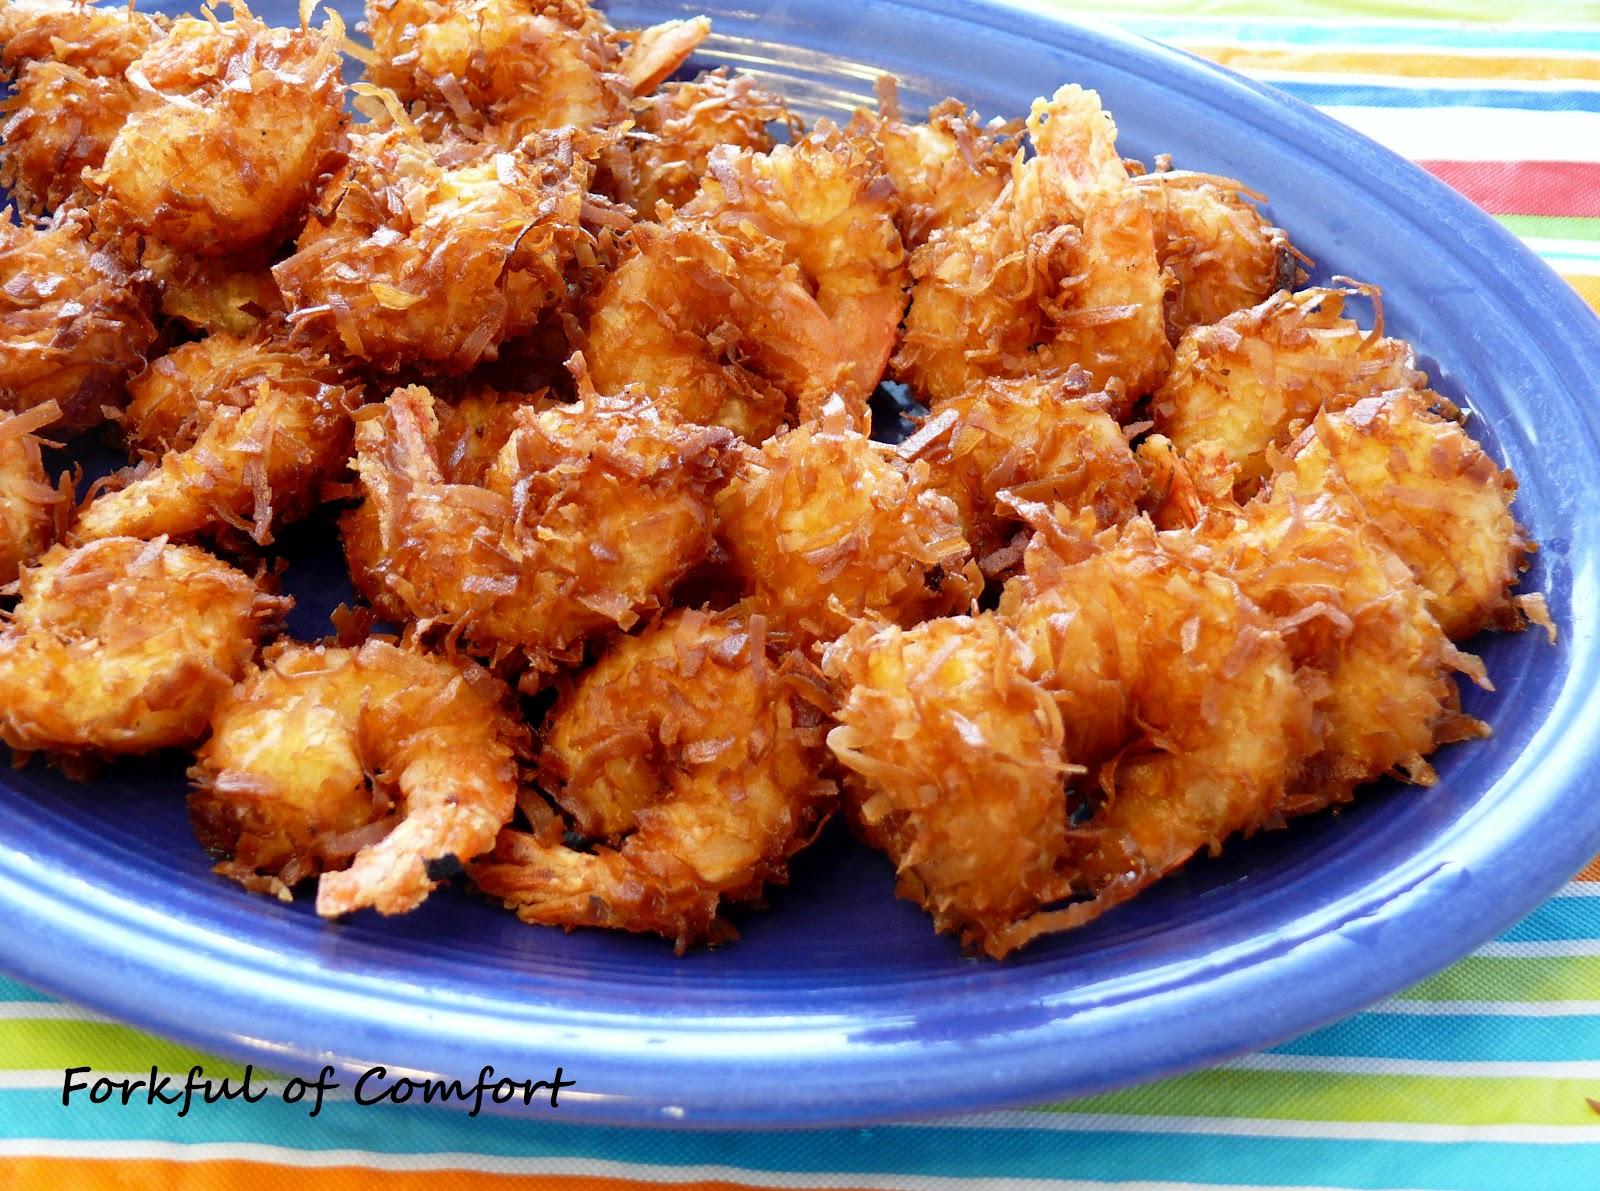 ... coconut shrimp coconut shrimp soup coconut shrimp salad coconut shrimp